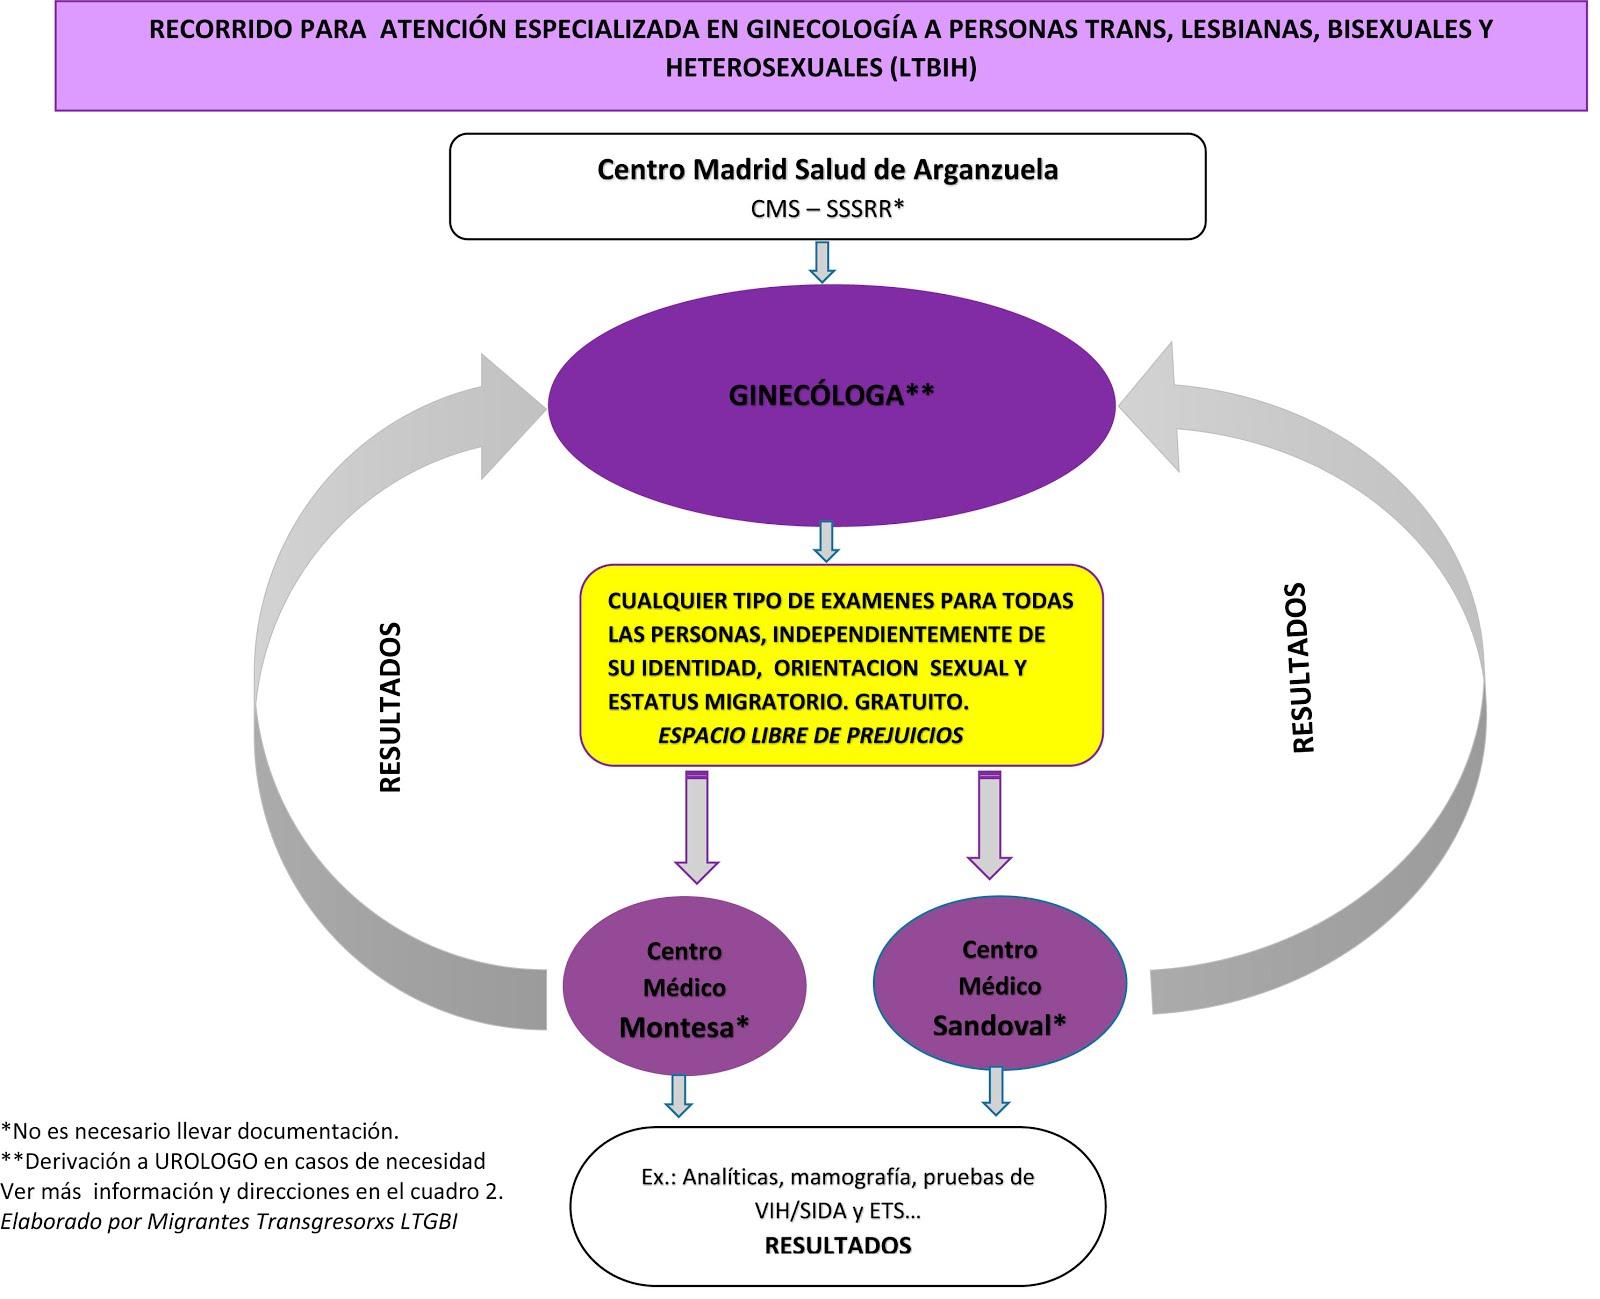 Salud sexual para mujeres lesbianas, personas transexuales, LTGBI